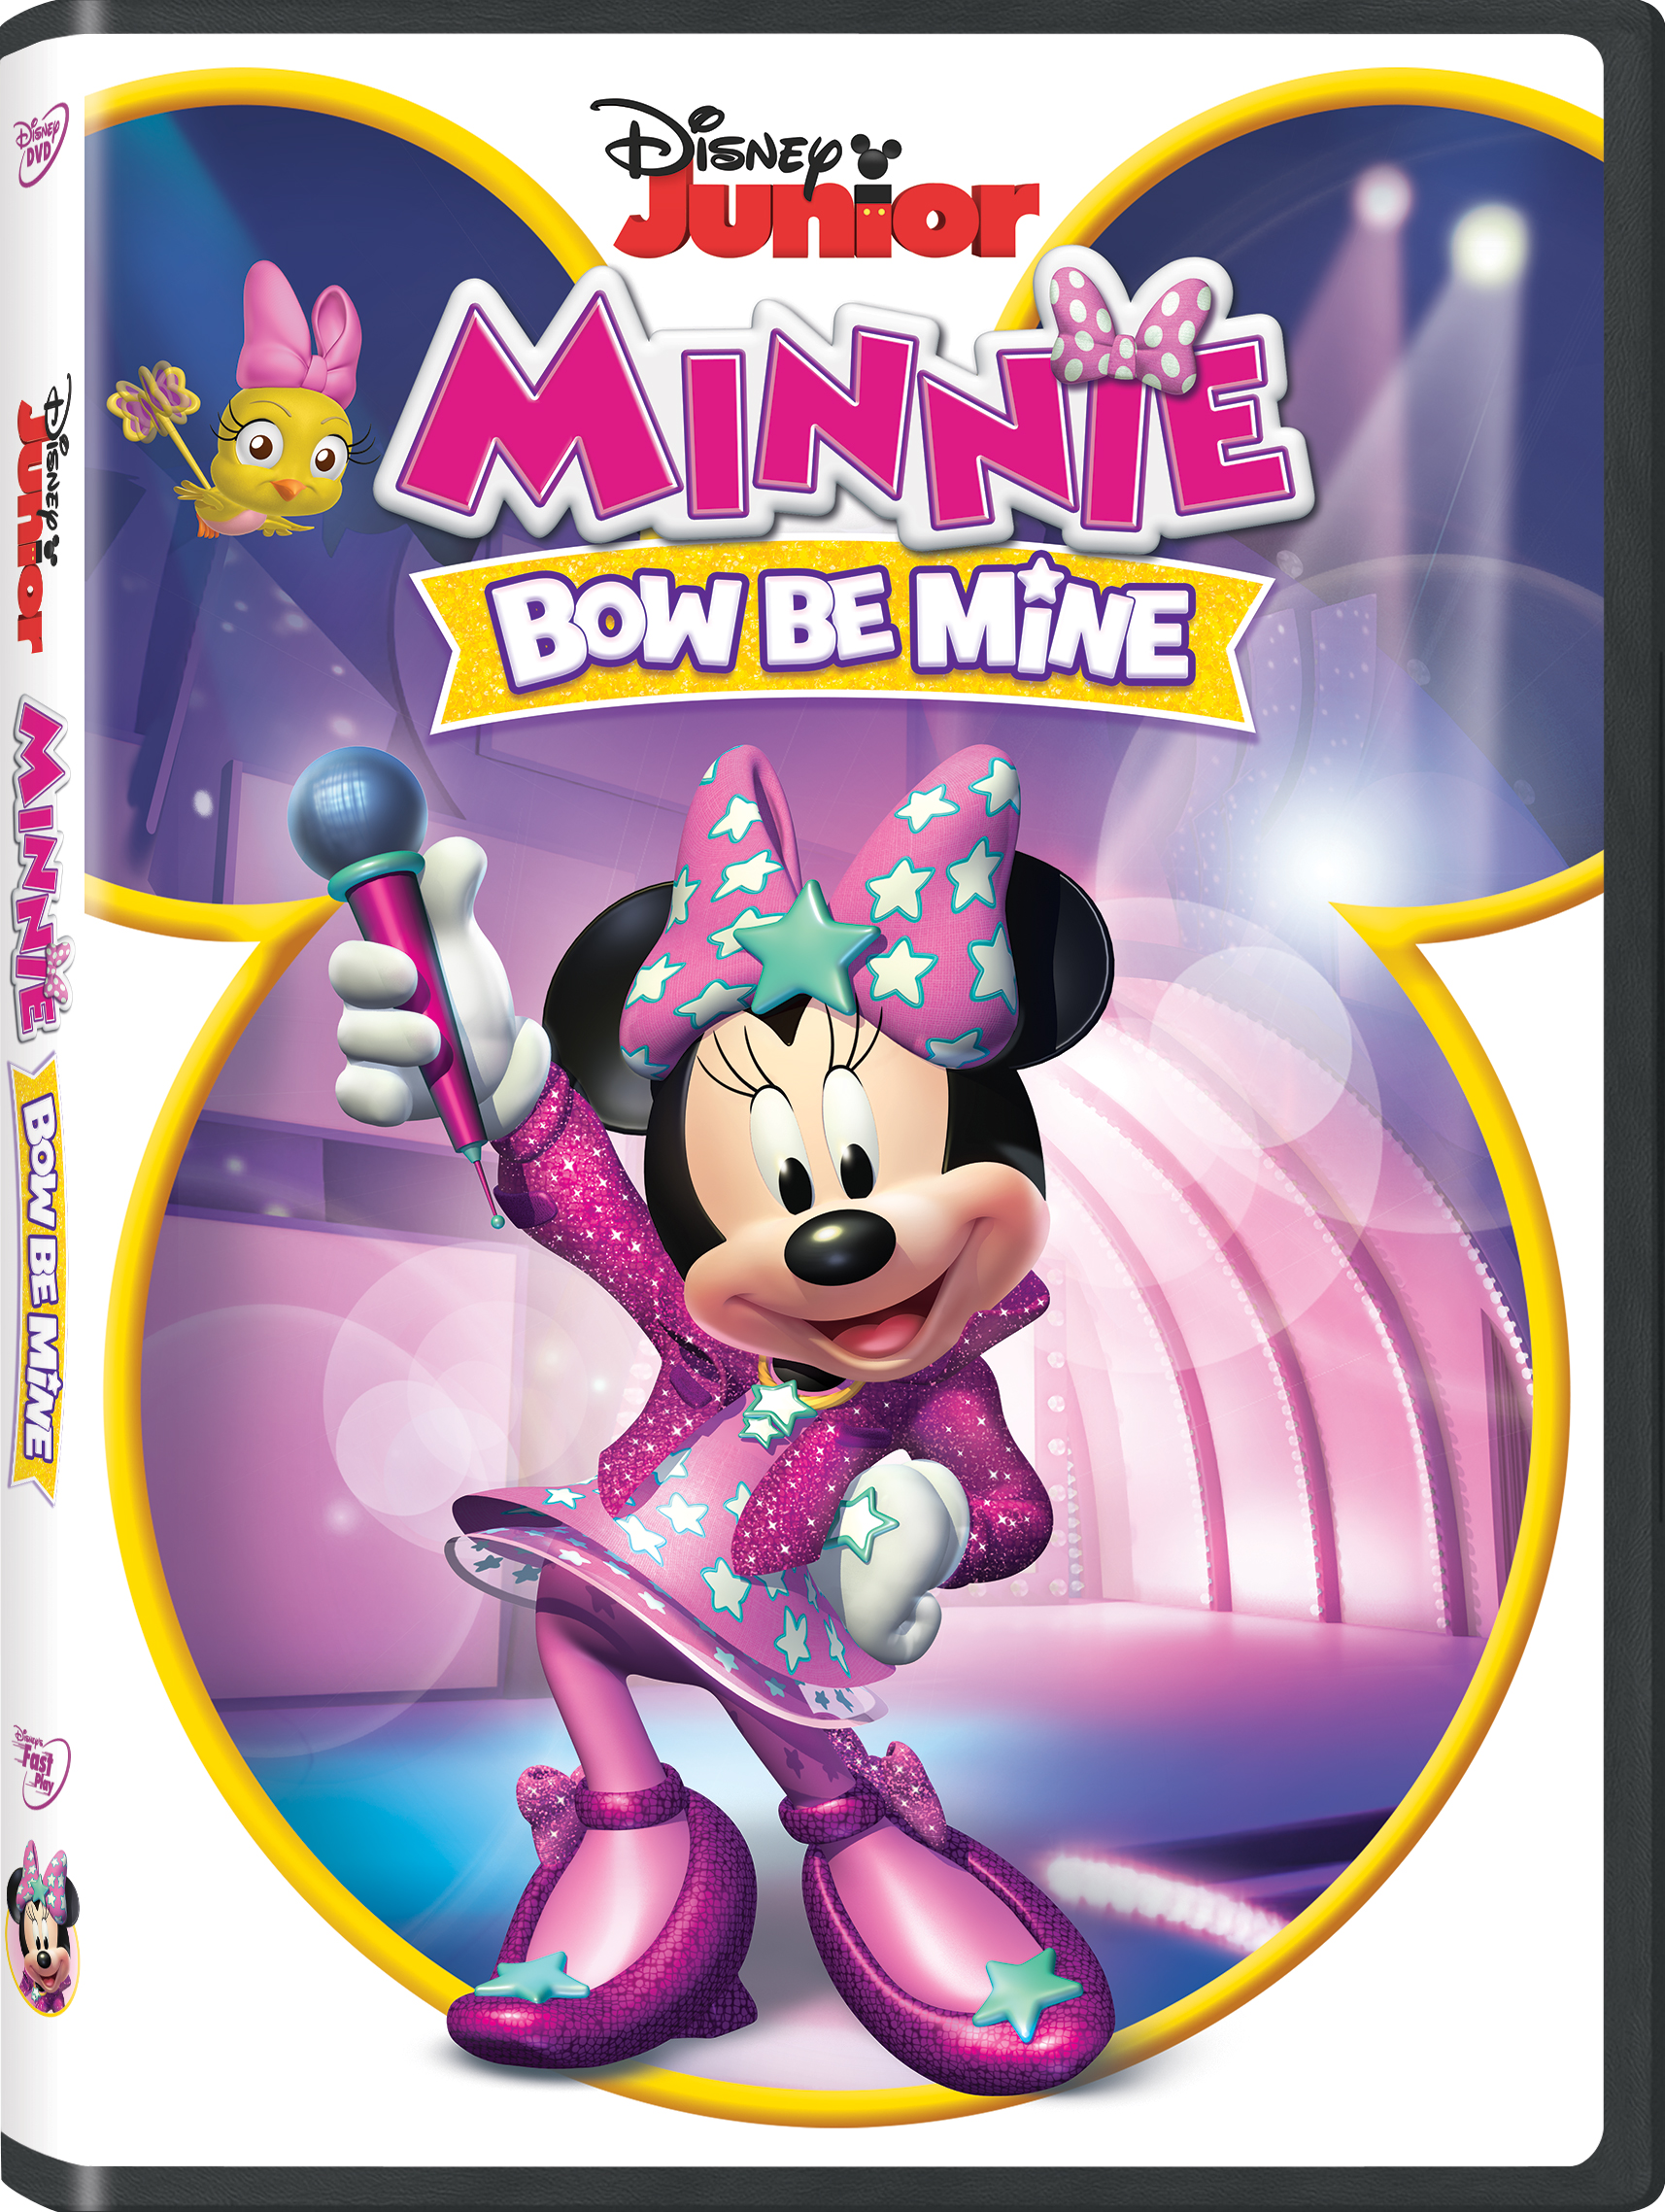 Minnie: Bow Be Mine on DVD + Giveaway - Redhead Mom